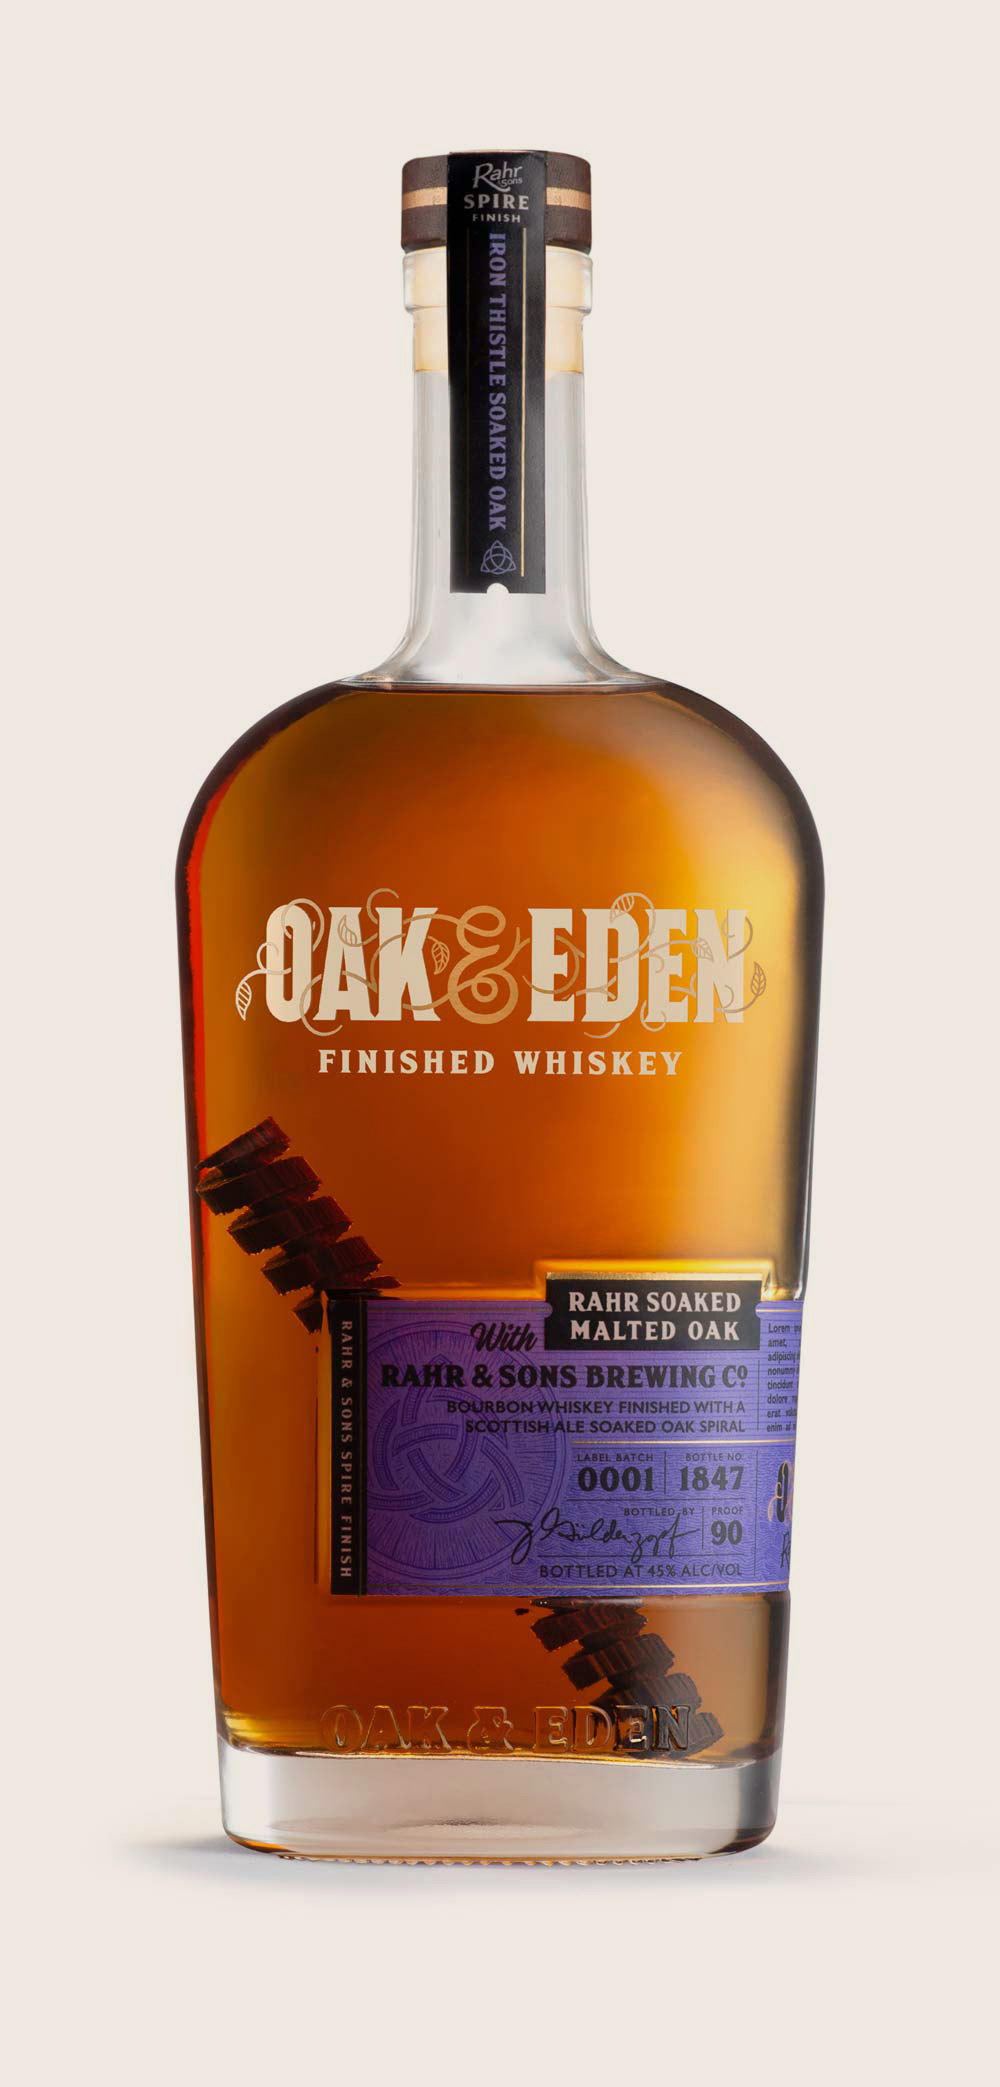 Oak & Eden Rahr & Sons